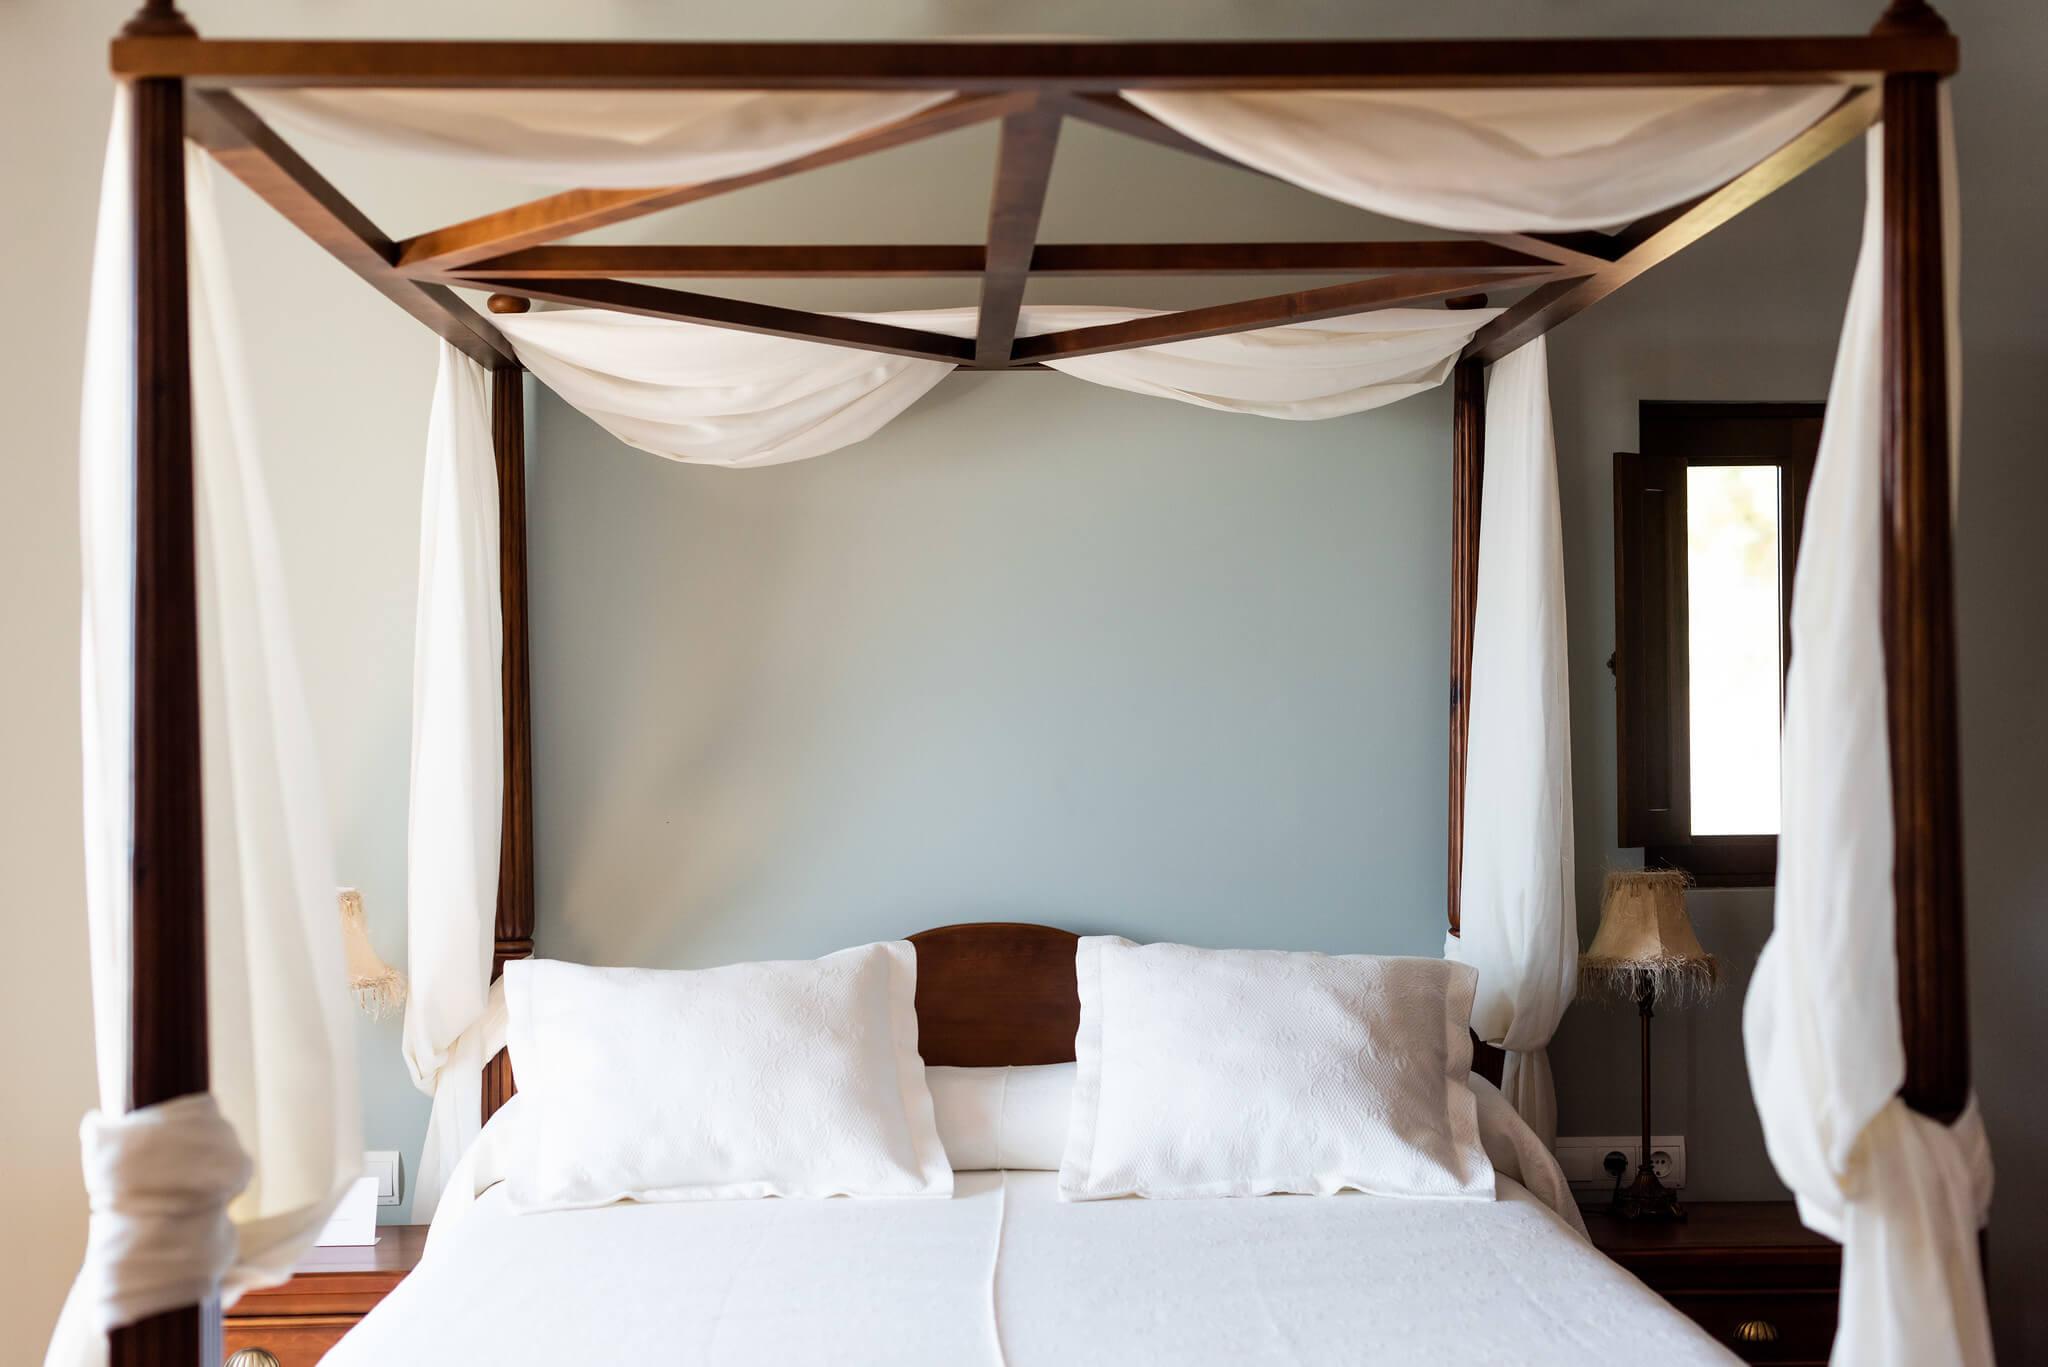 https://www.white-ibiza.com/wp-content/uploads/2020/03/white-ibiza-boutique-hotels-casa-maca-2020-04.jpg